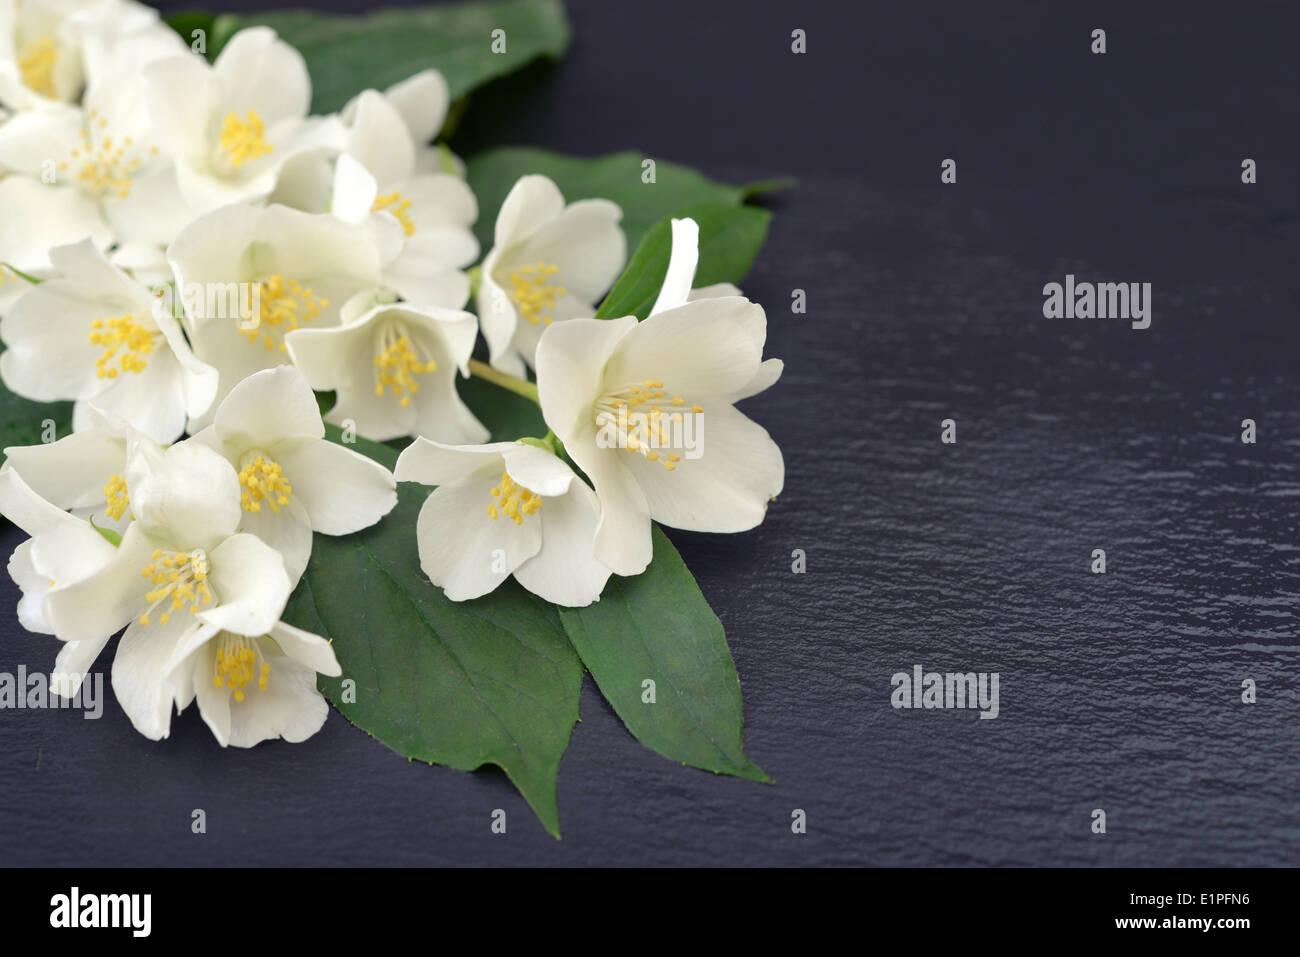 Bouquet of jasmine flowers on wet graphite background - Stock Image